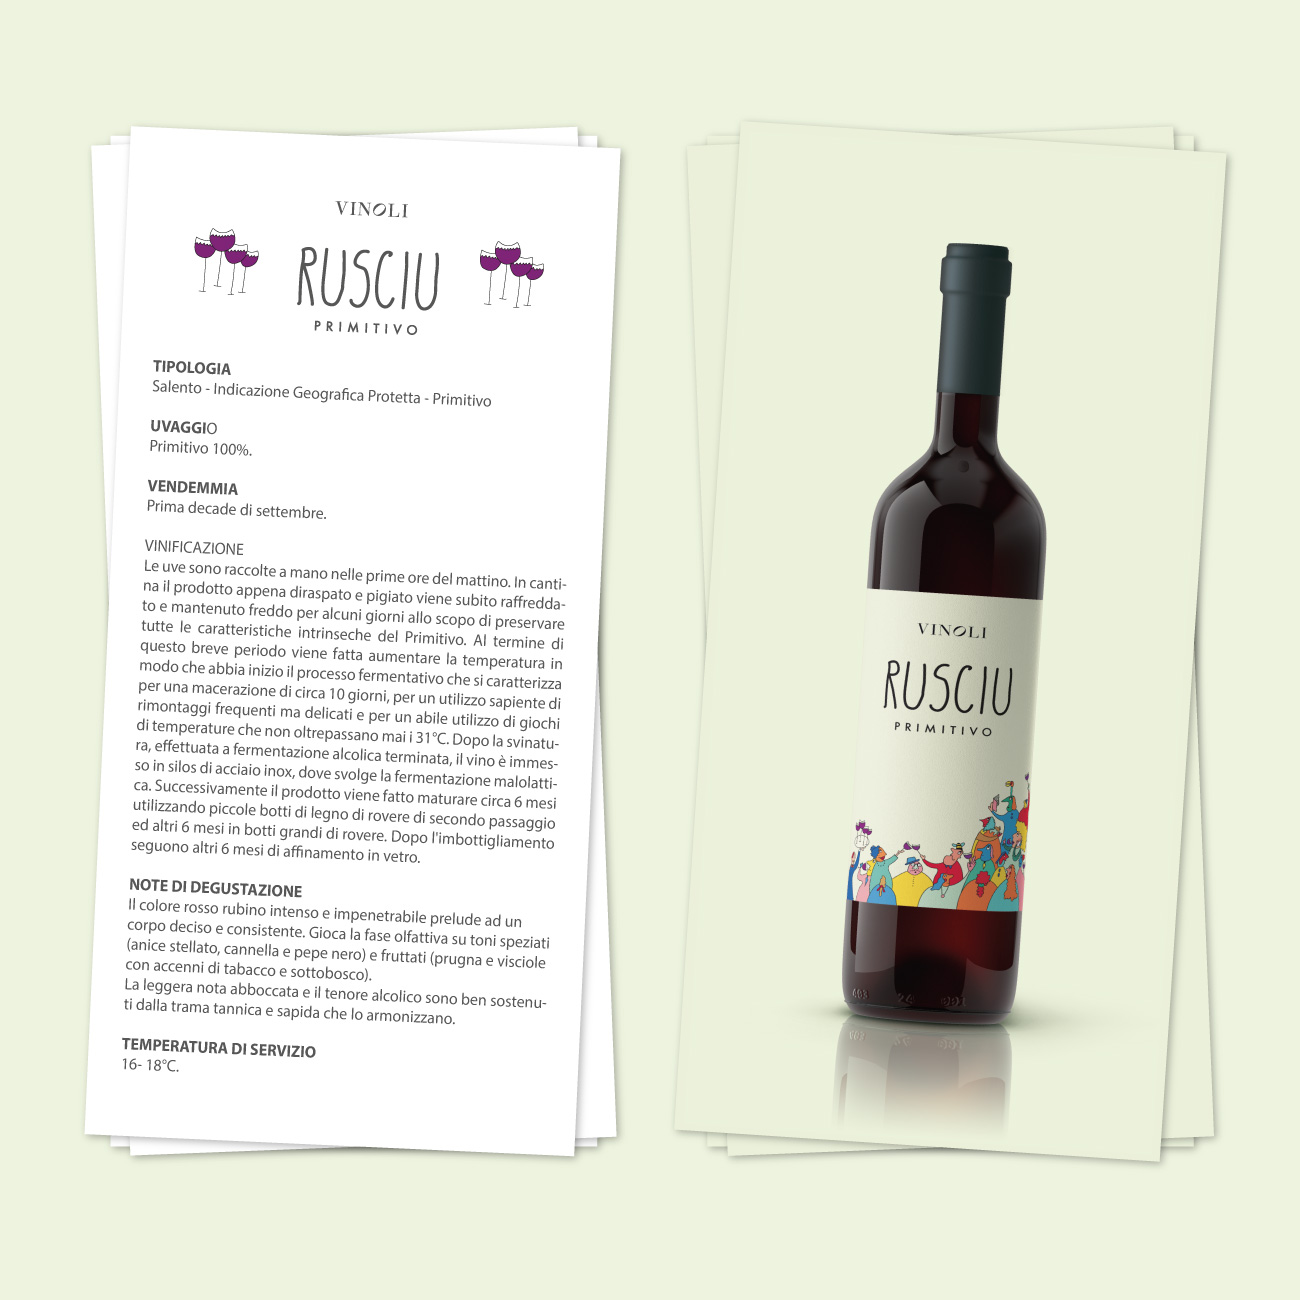 https://www.orlandinifrancesco.com/wp/wp-content/uploads/2019/07/Vinoli-Scheda-Tecnica-Rusciu-Orlandini-Francesco-1.jpg